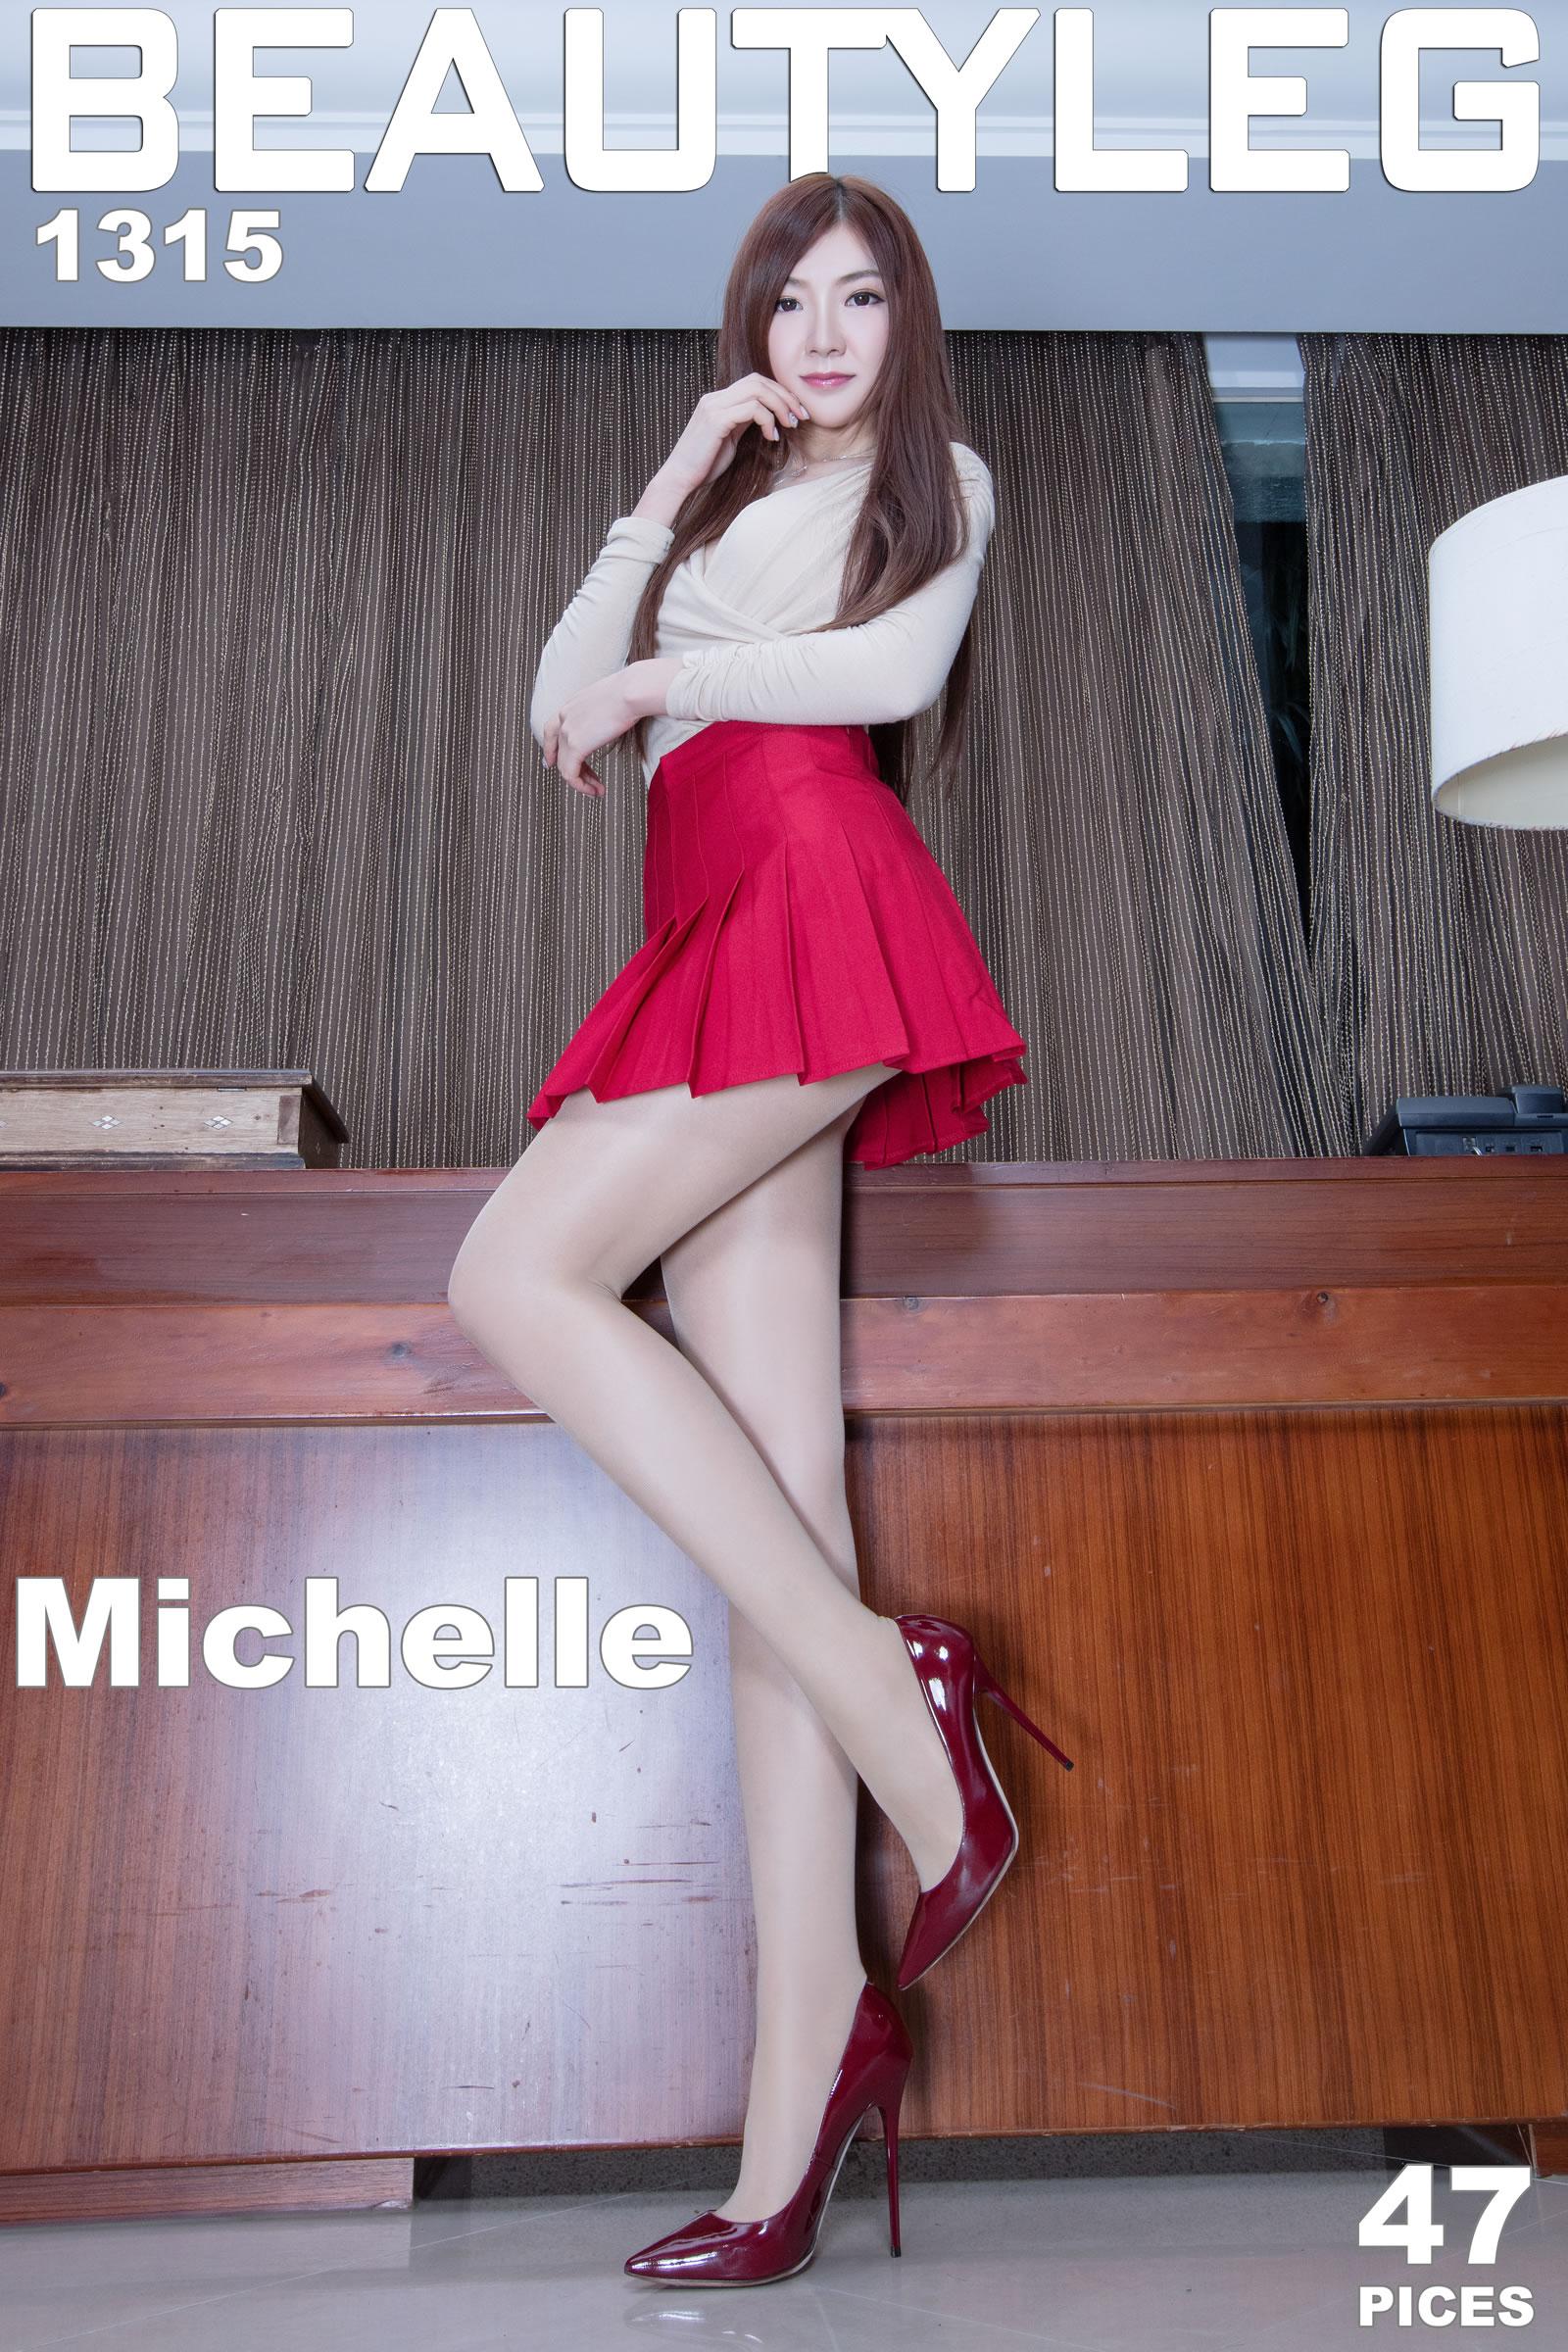 [beautyleg丝袜美腿模特写真]米色上衣加红色蓬蓬裙美女Michelle厚肉丝裤袜与酒红色高跟美腿写真